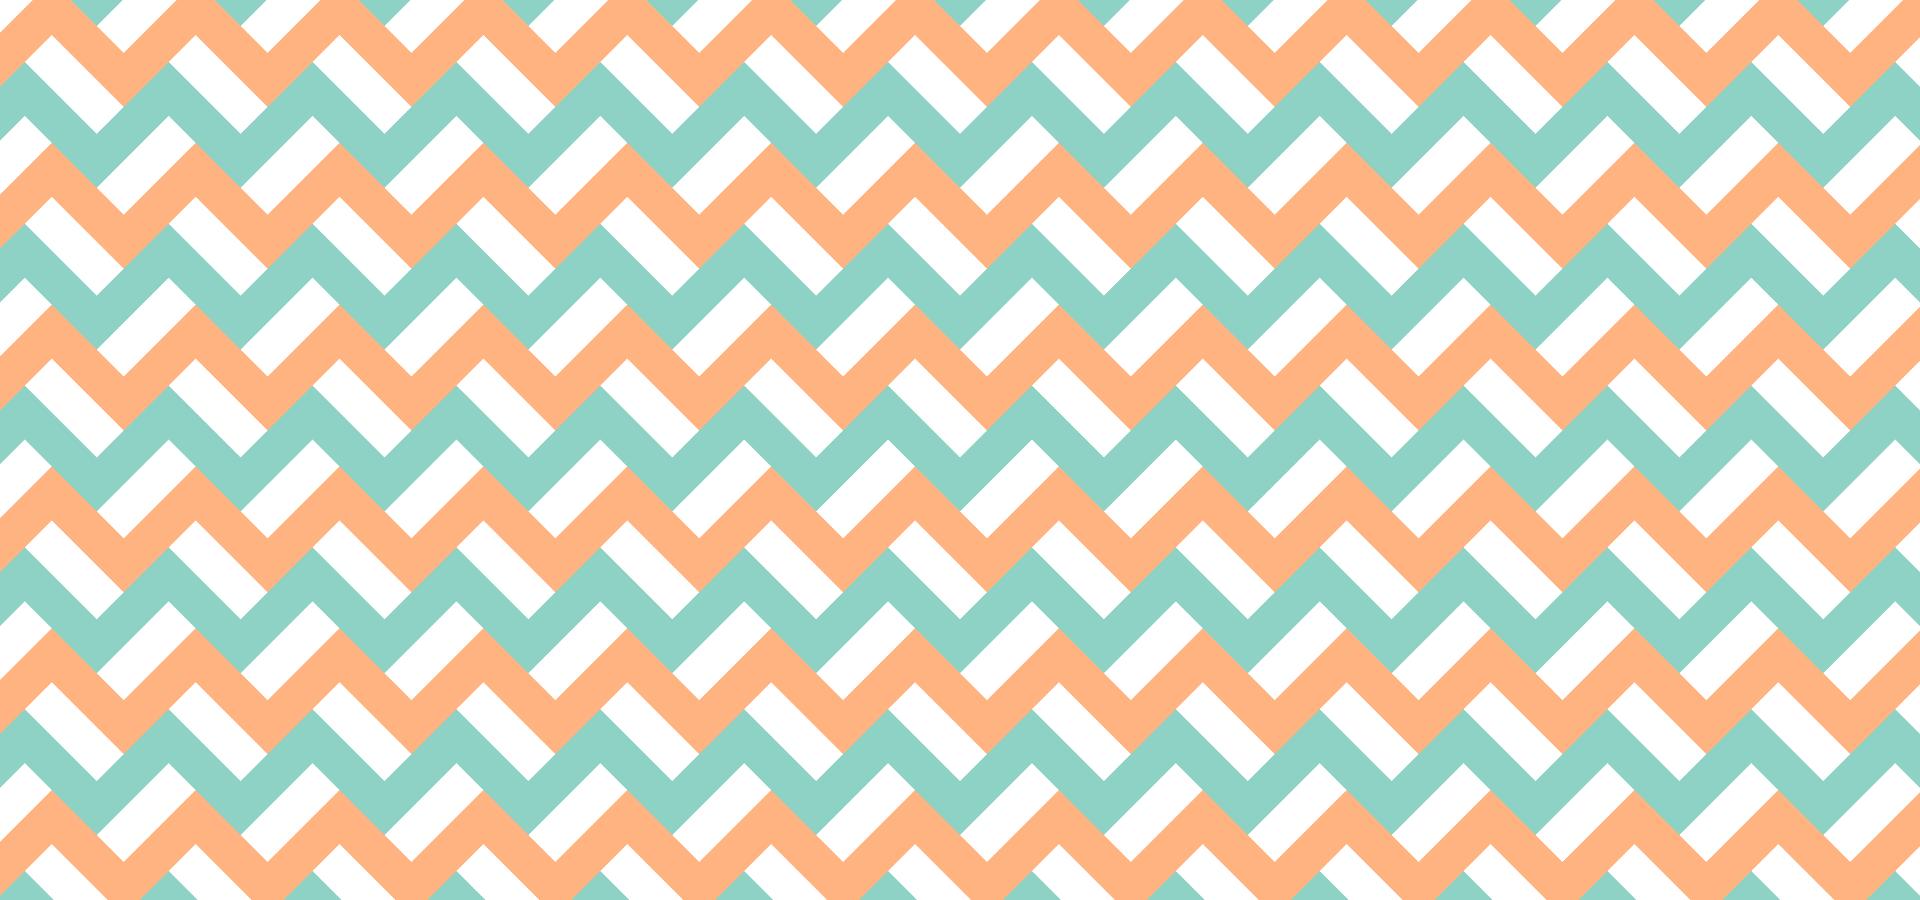 Motif zigzags oranges et turquoises